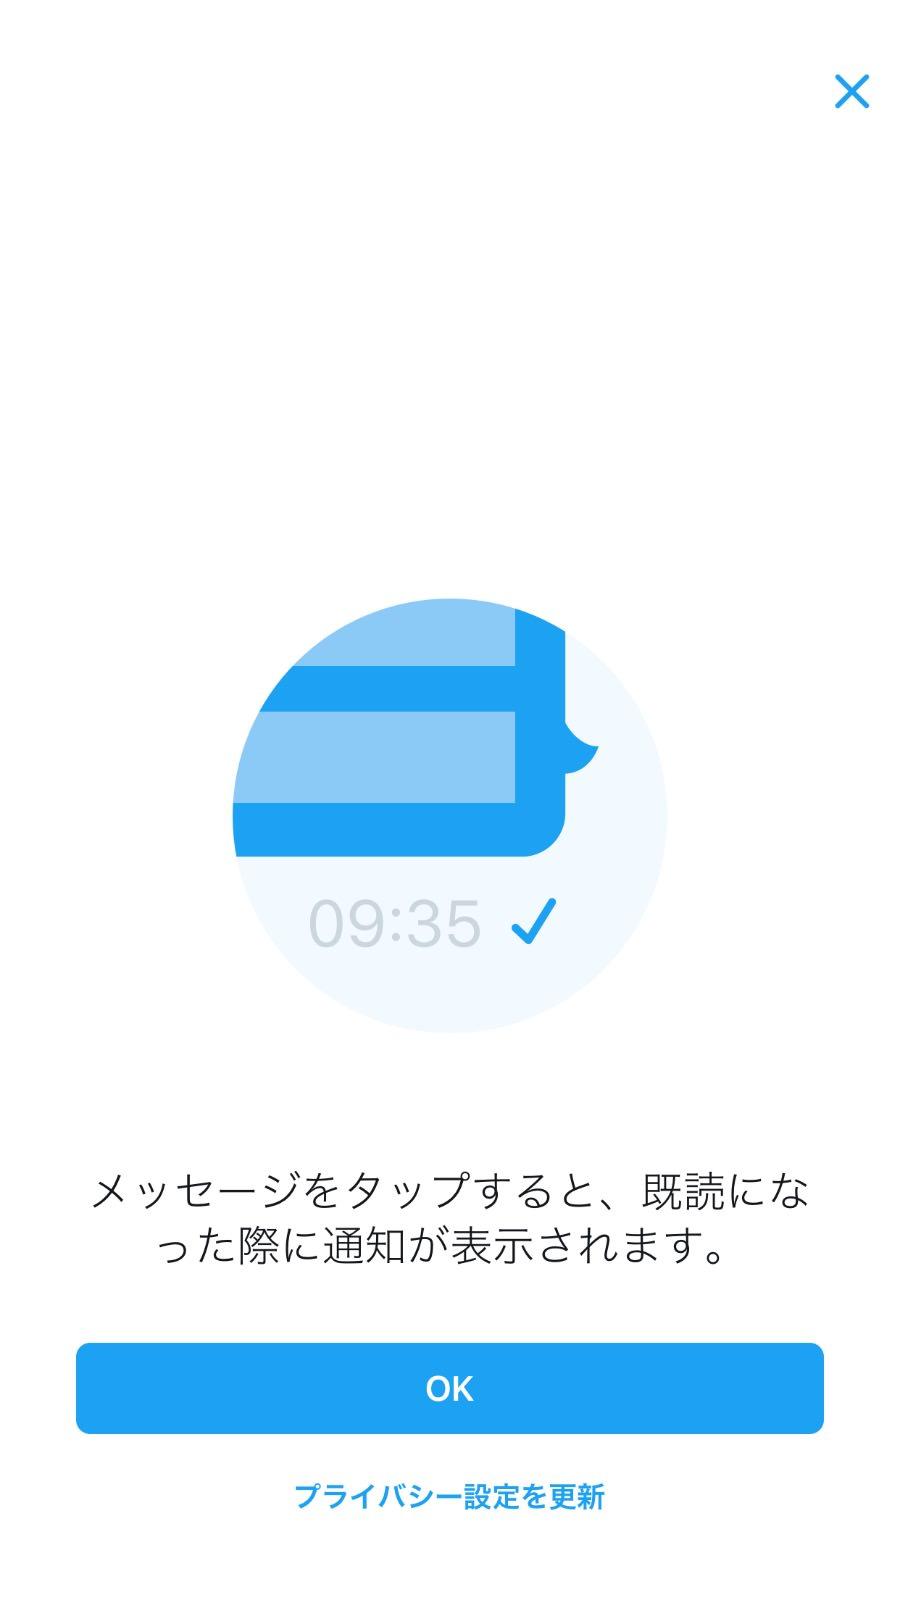 Twitter kidoku 8318